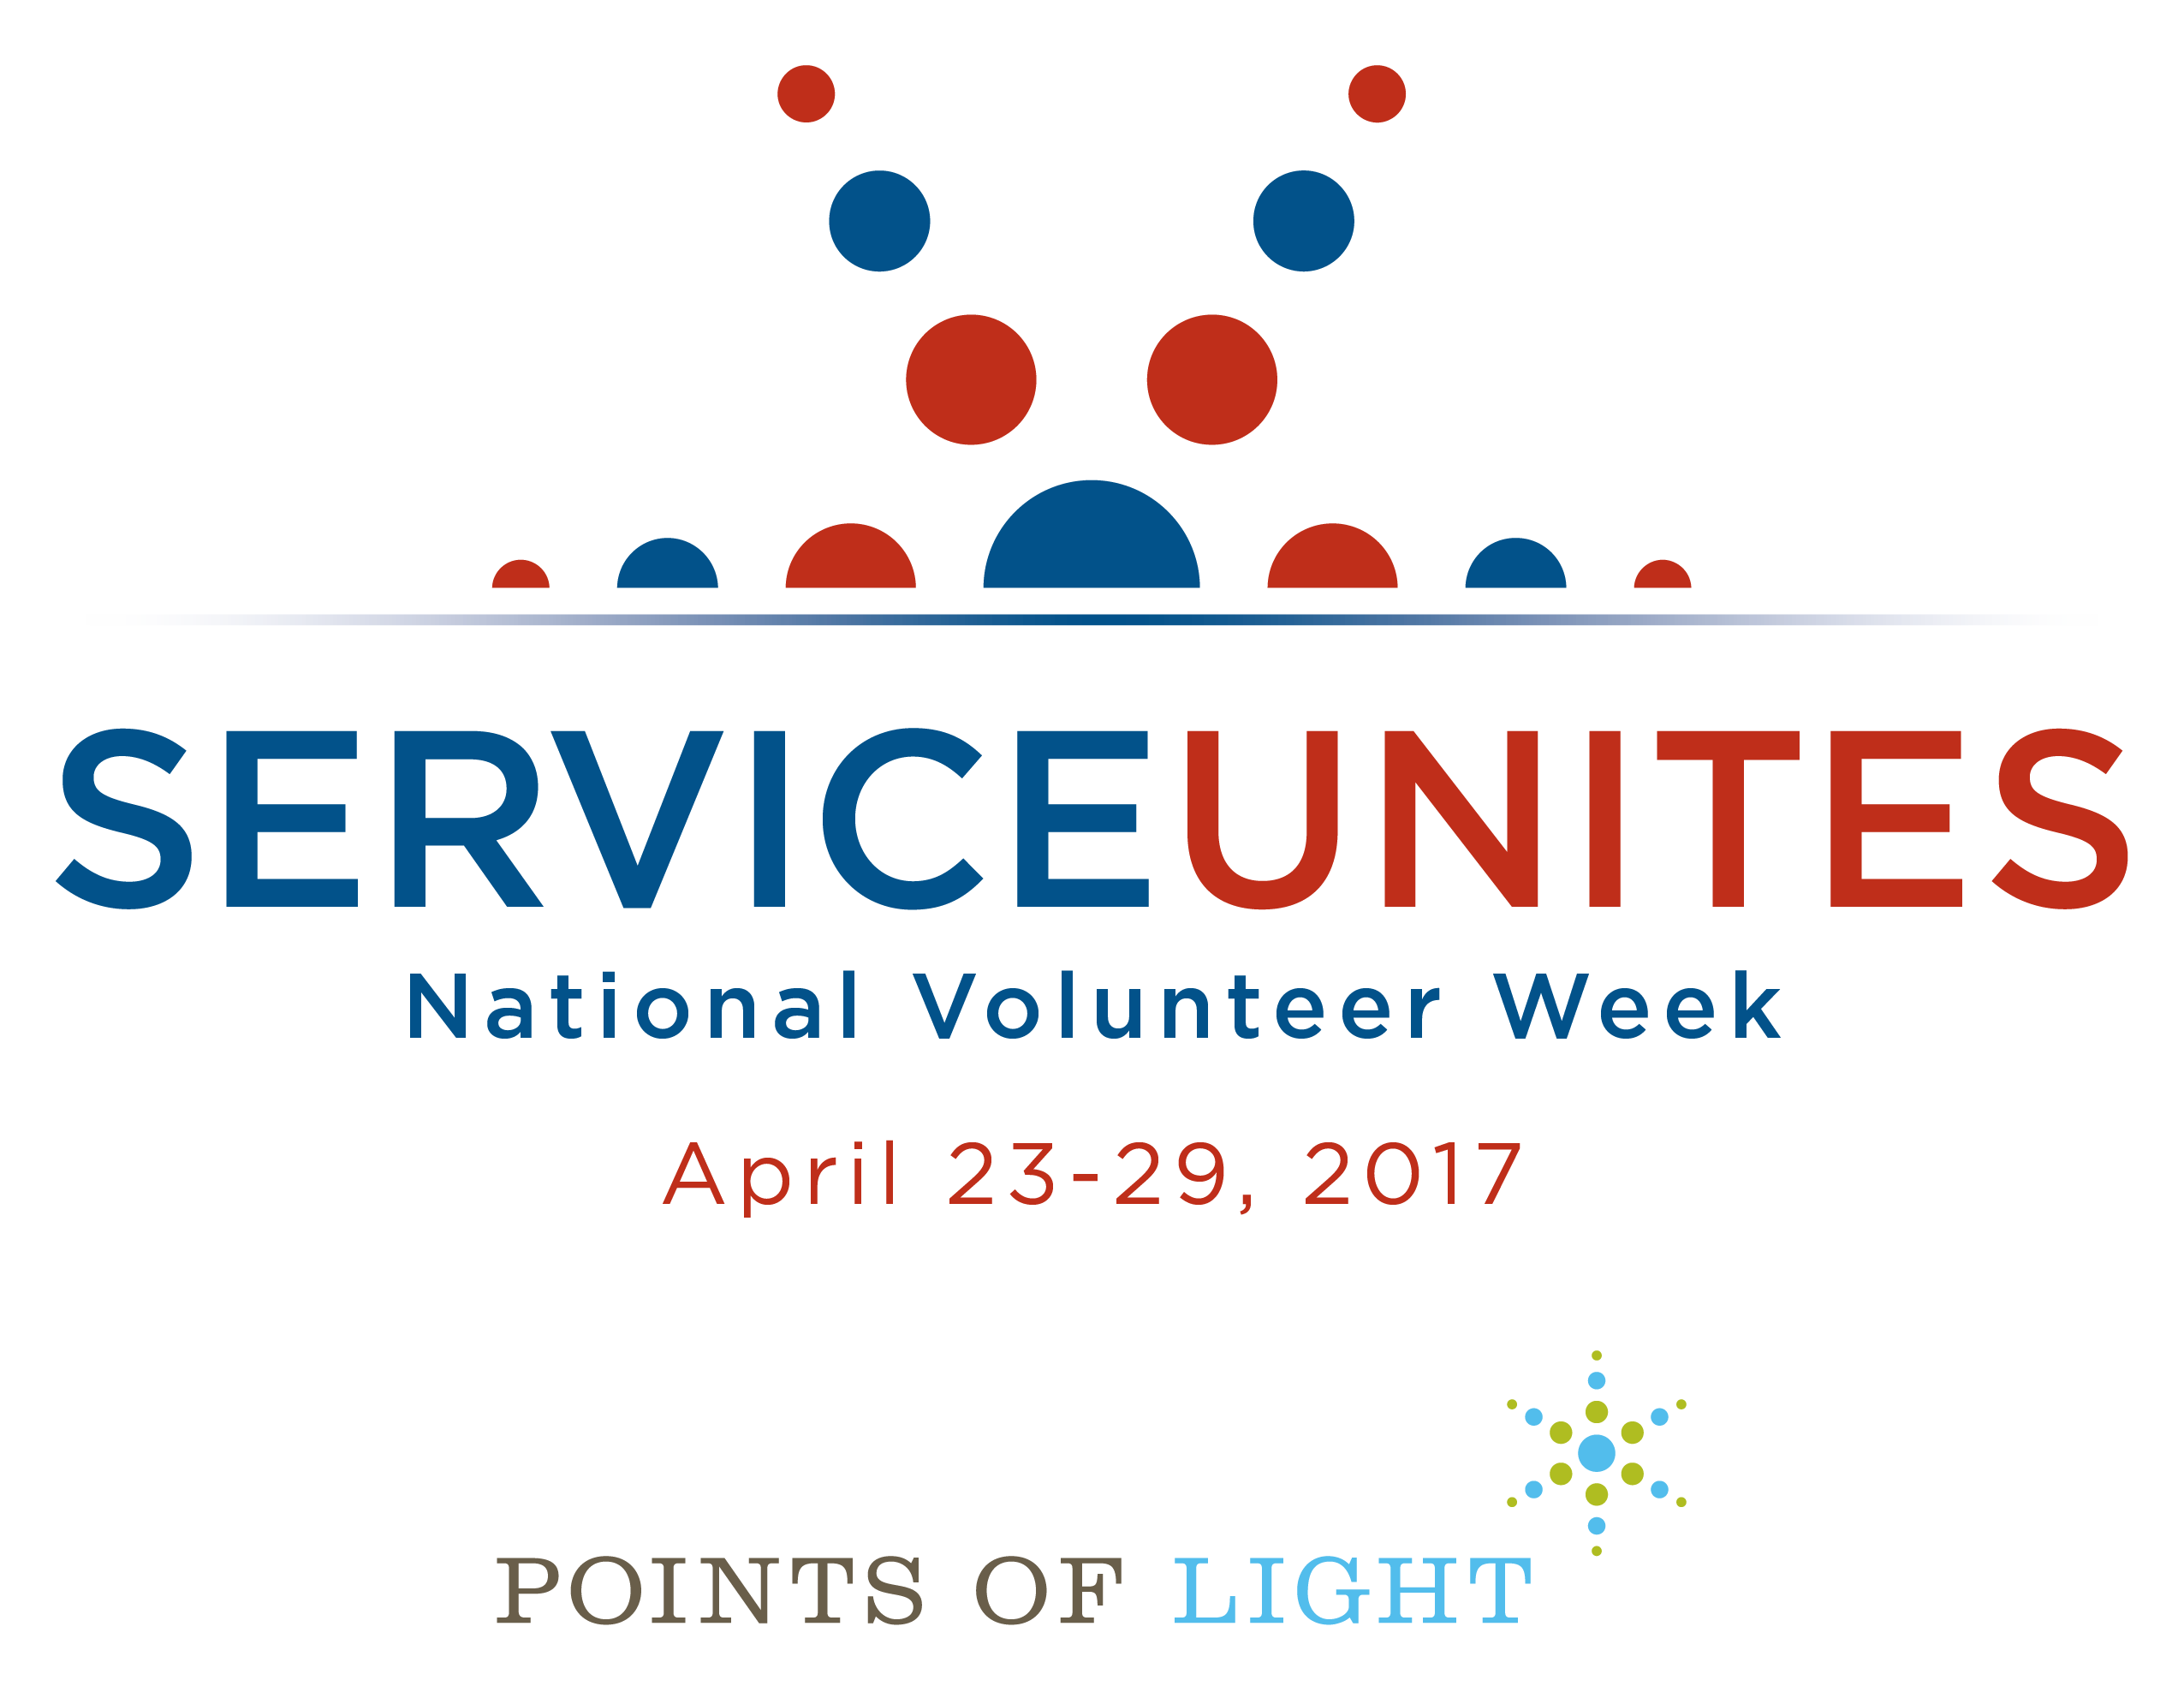 Volunteering clipart many hands make light work. Handson san diego national